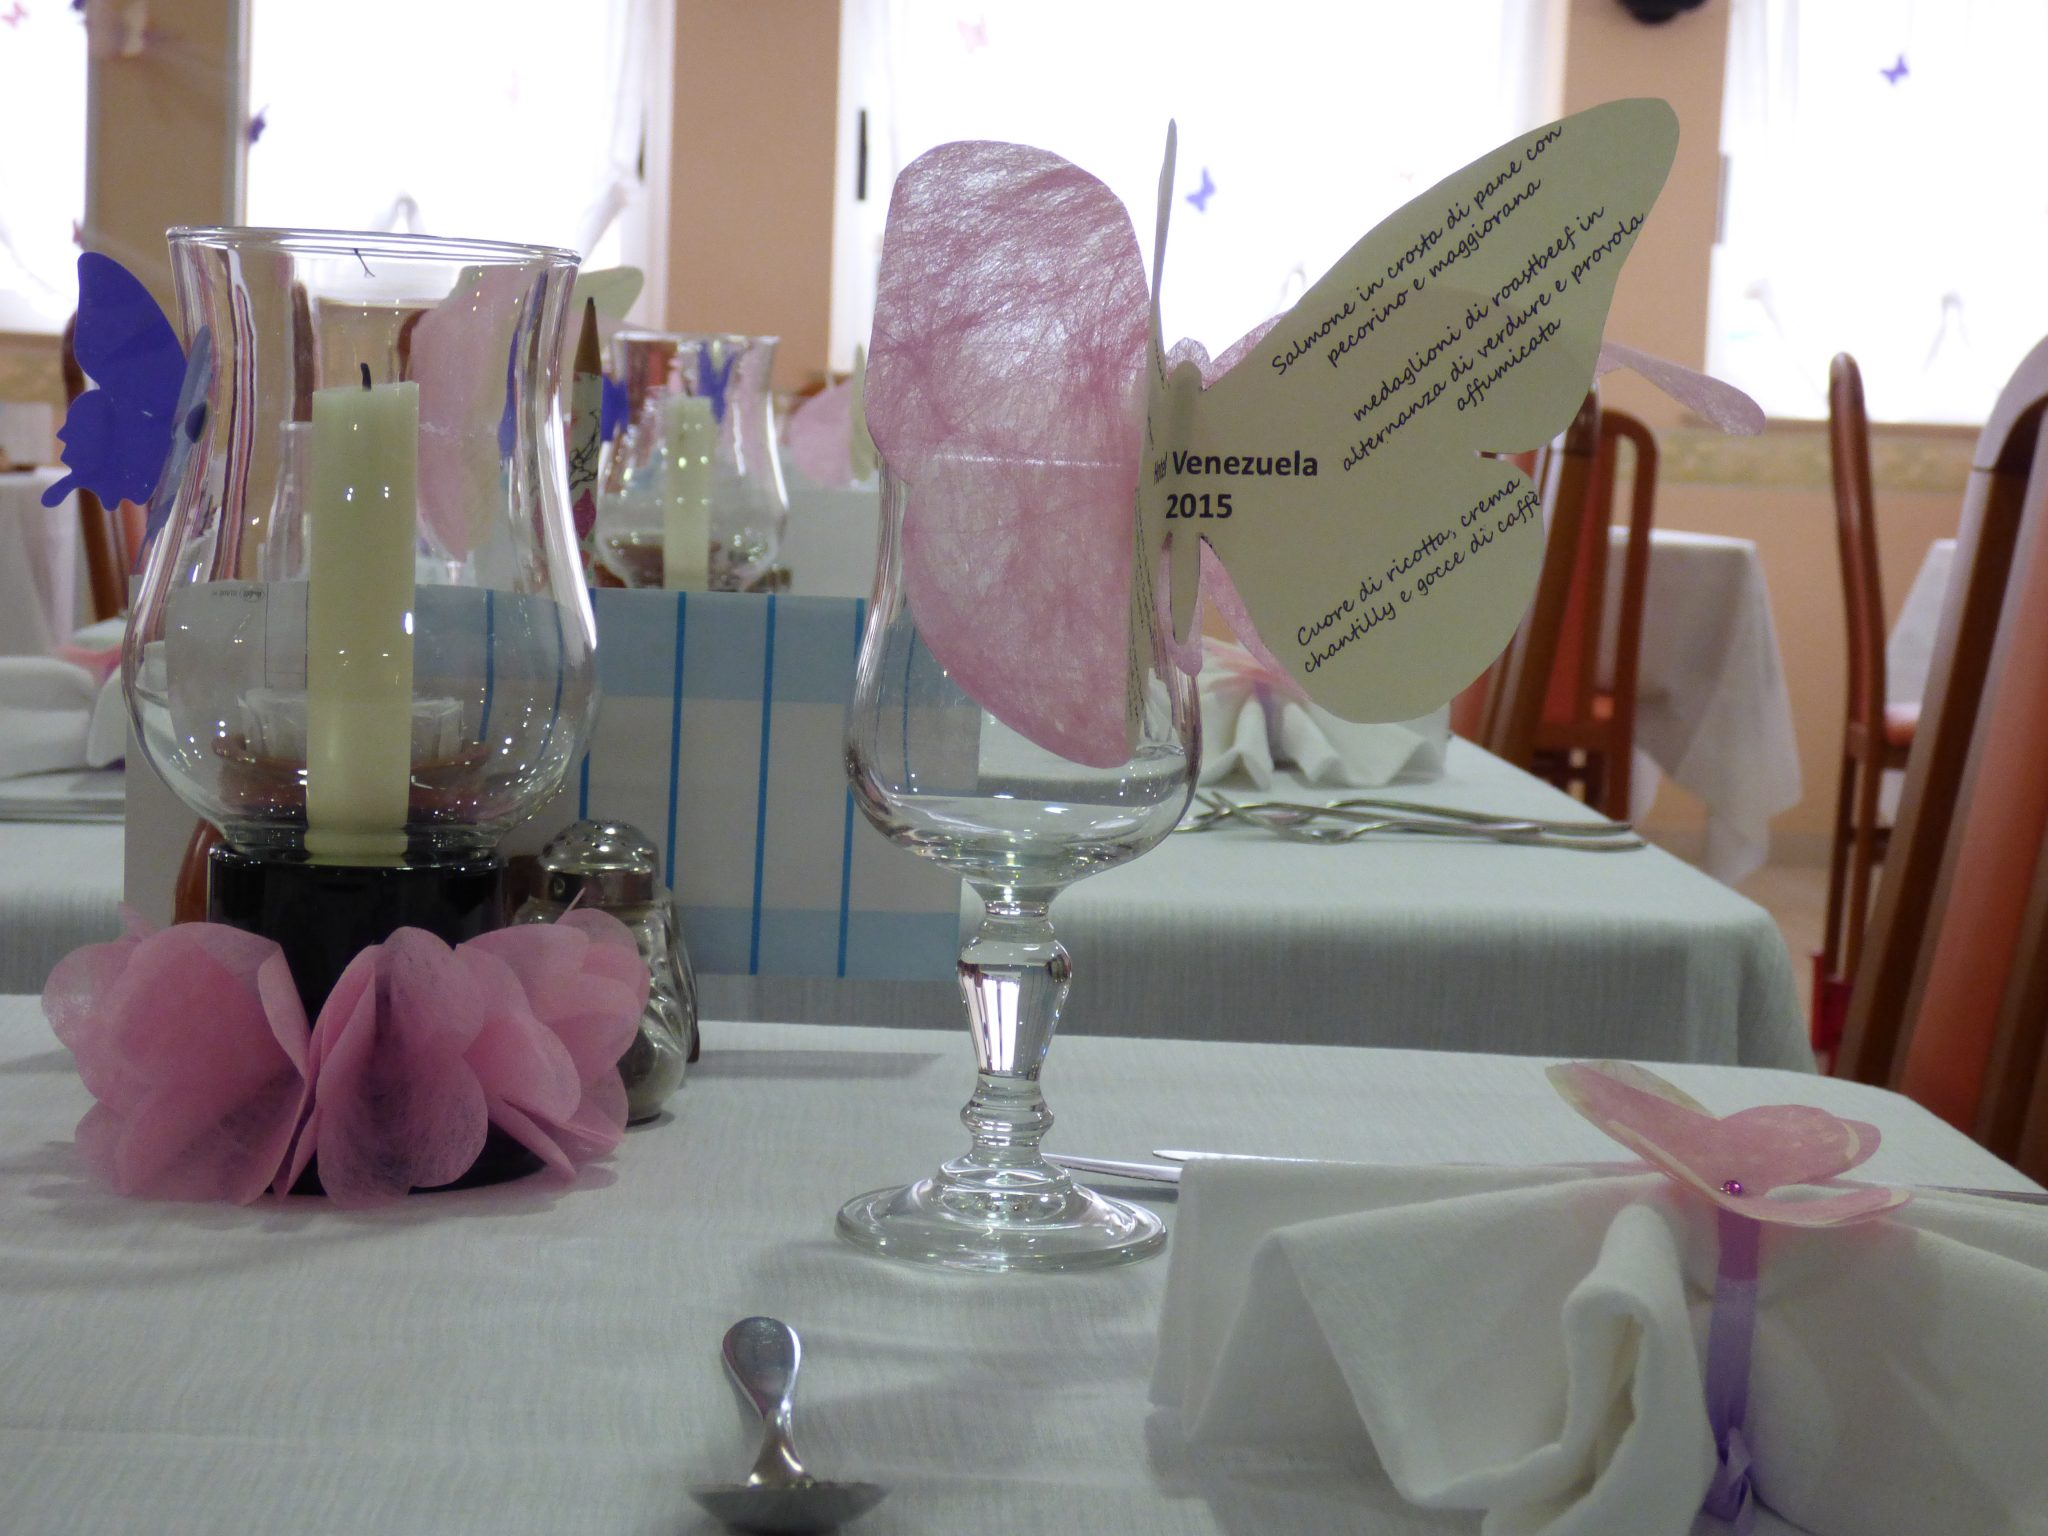 http://www.hotelvenezuela.it/wp-content/uploads/2016/02/P1040336.jpg